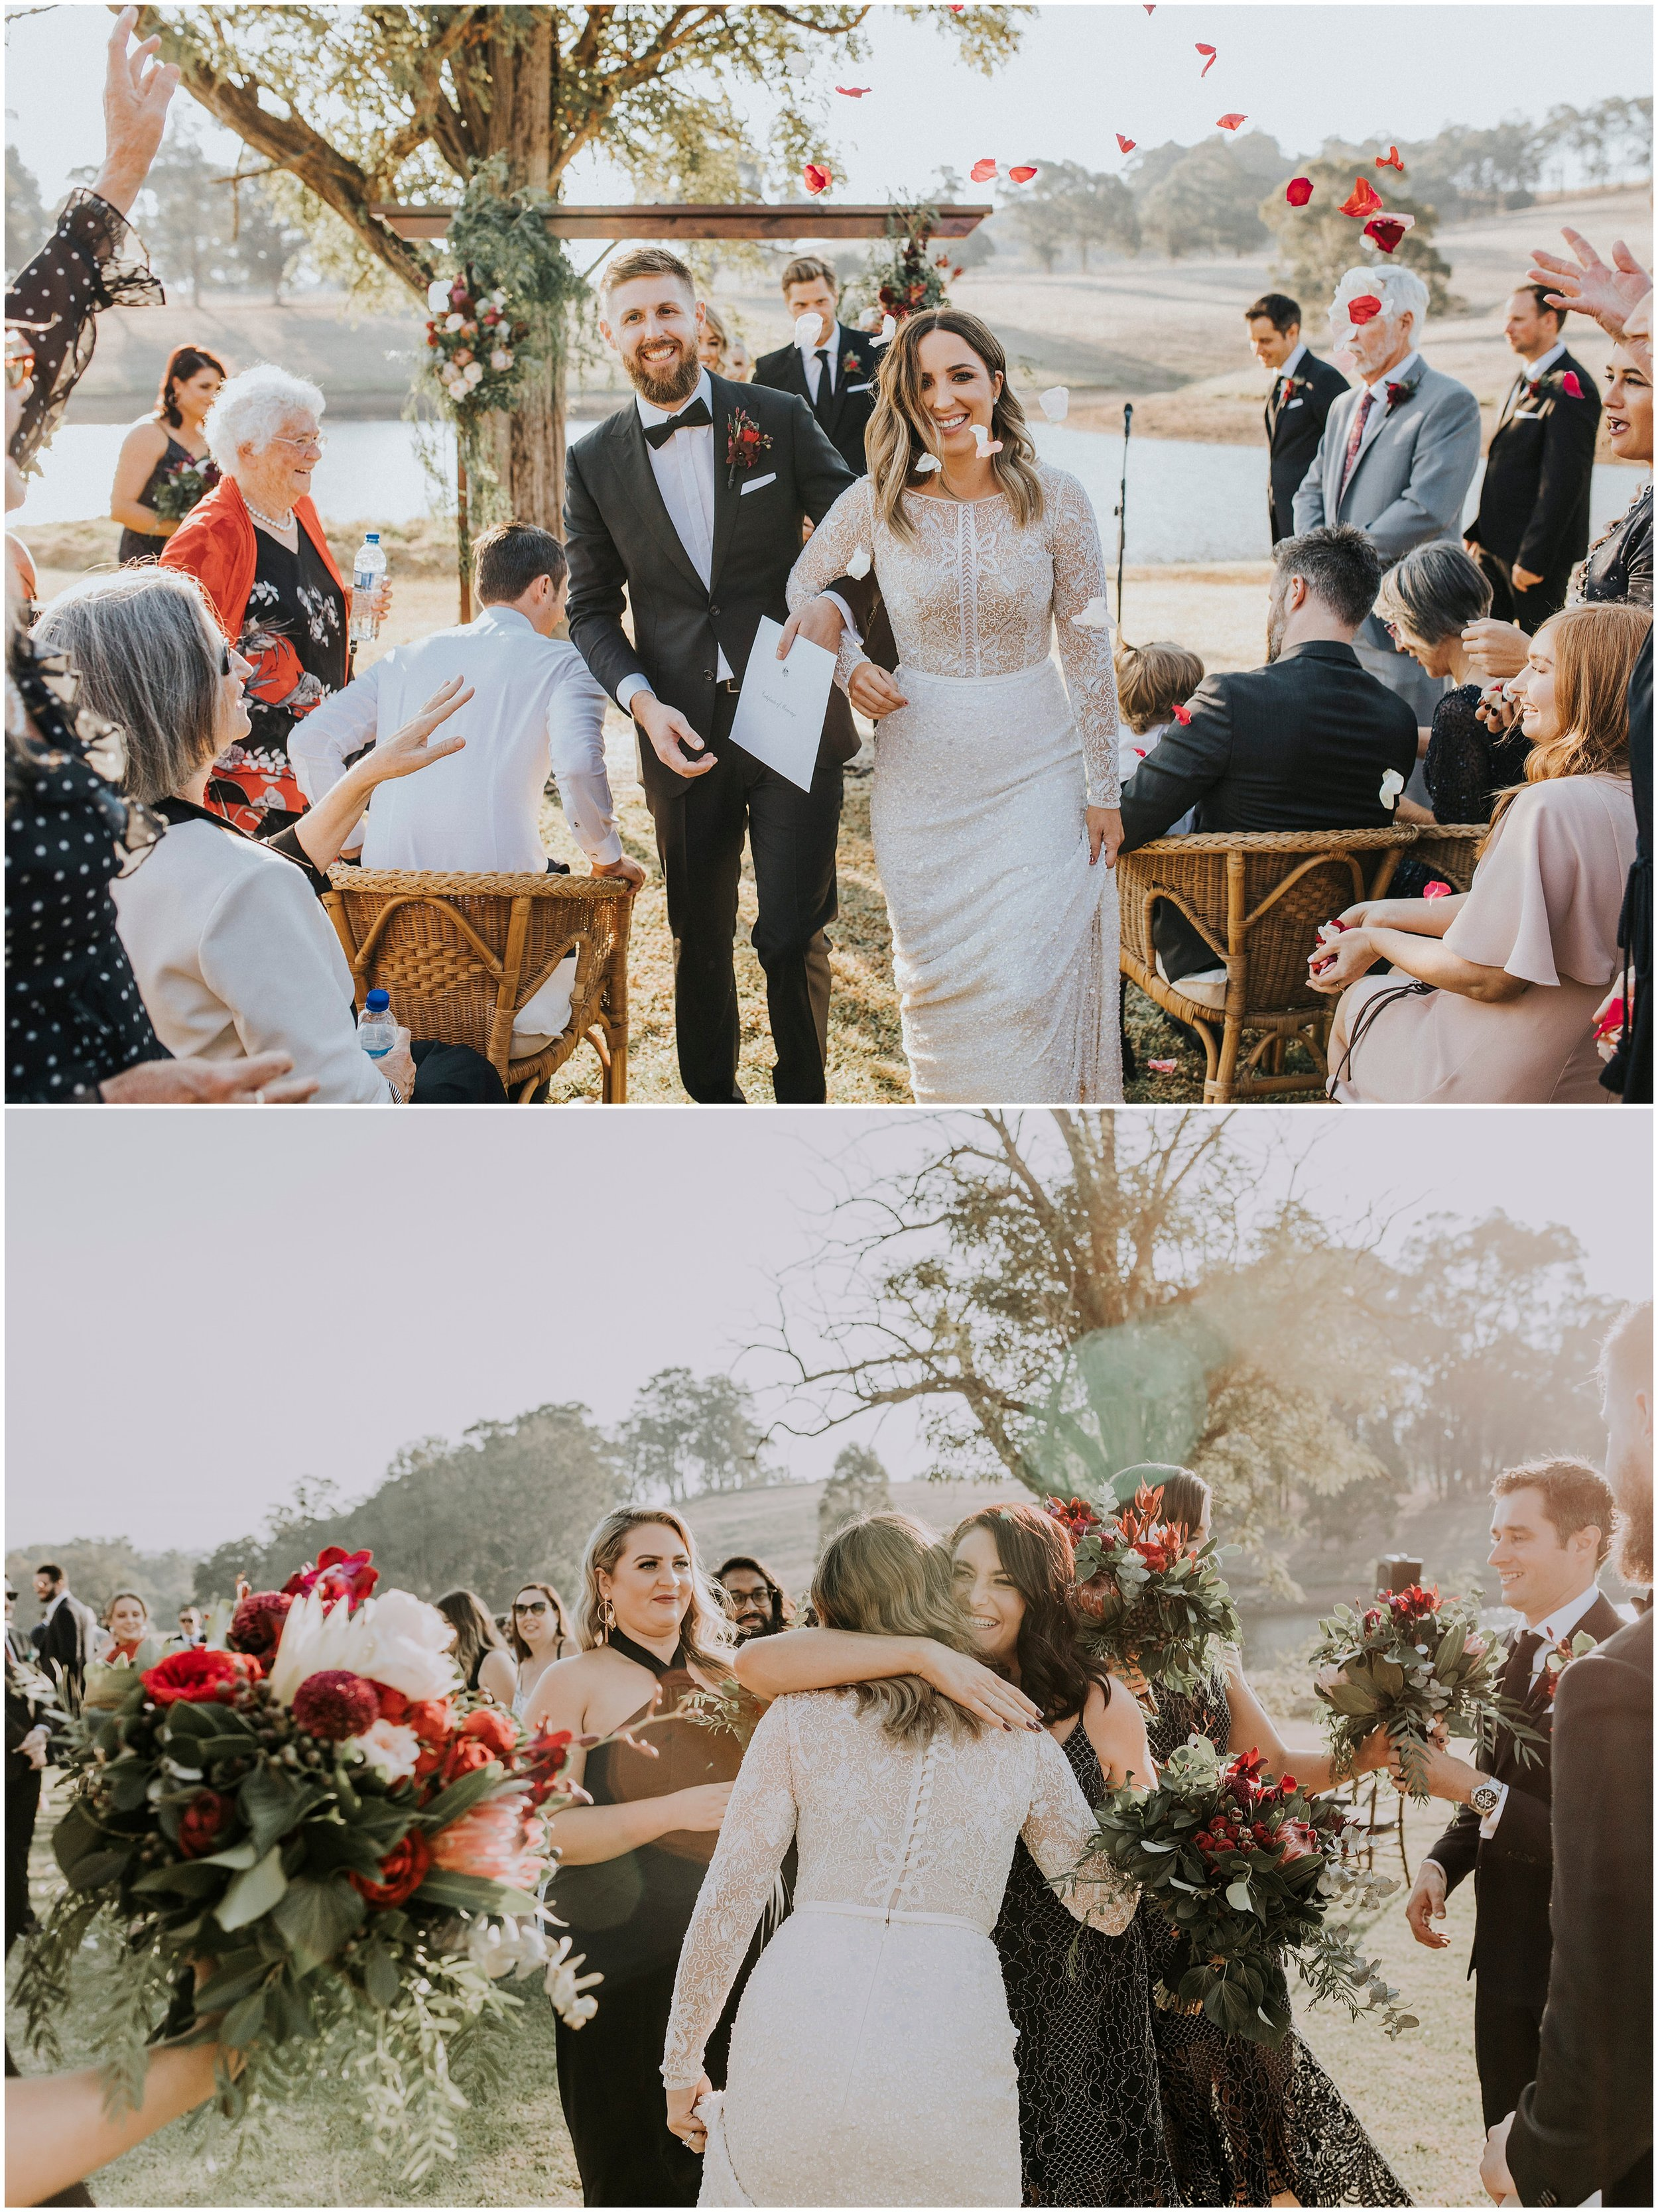 ferguson_valley_perth_wedding_photgorapher_keeper_creative_15.JPG